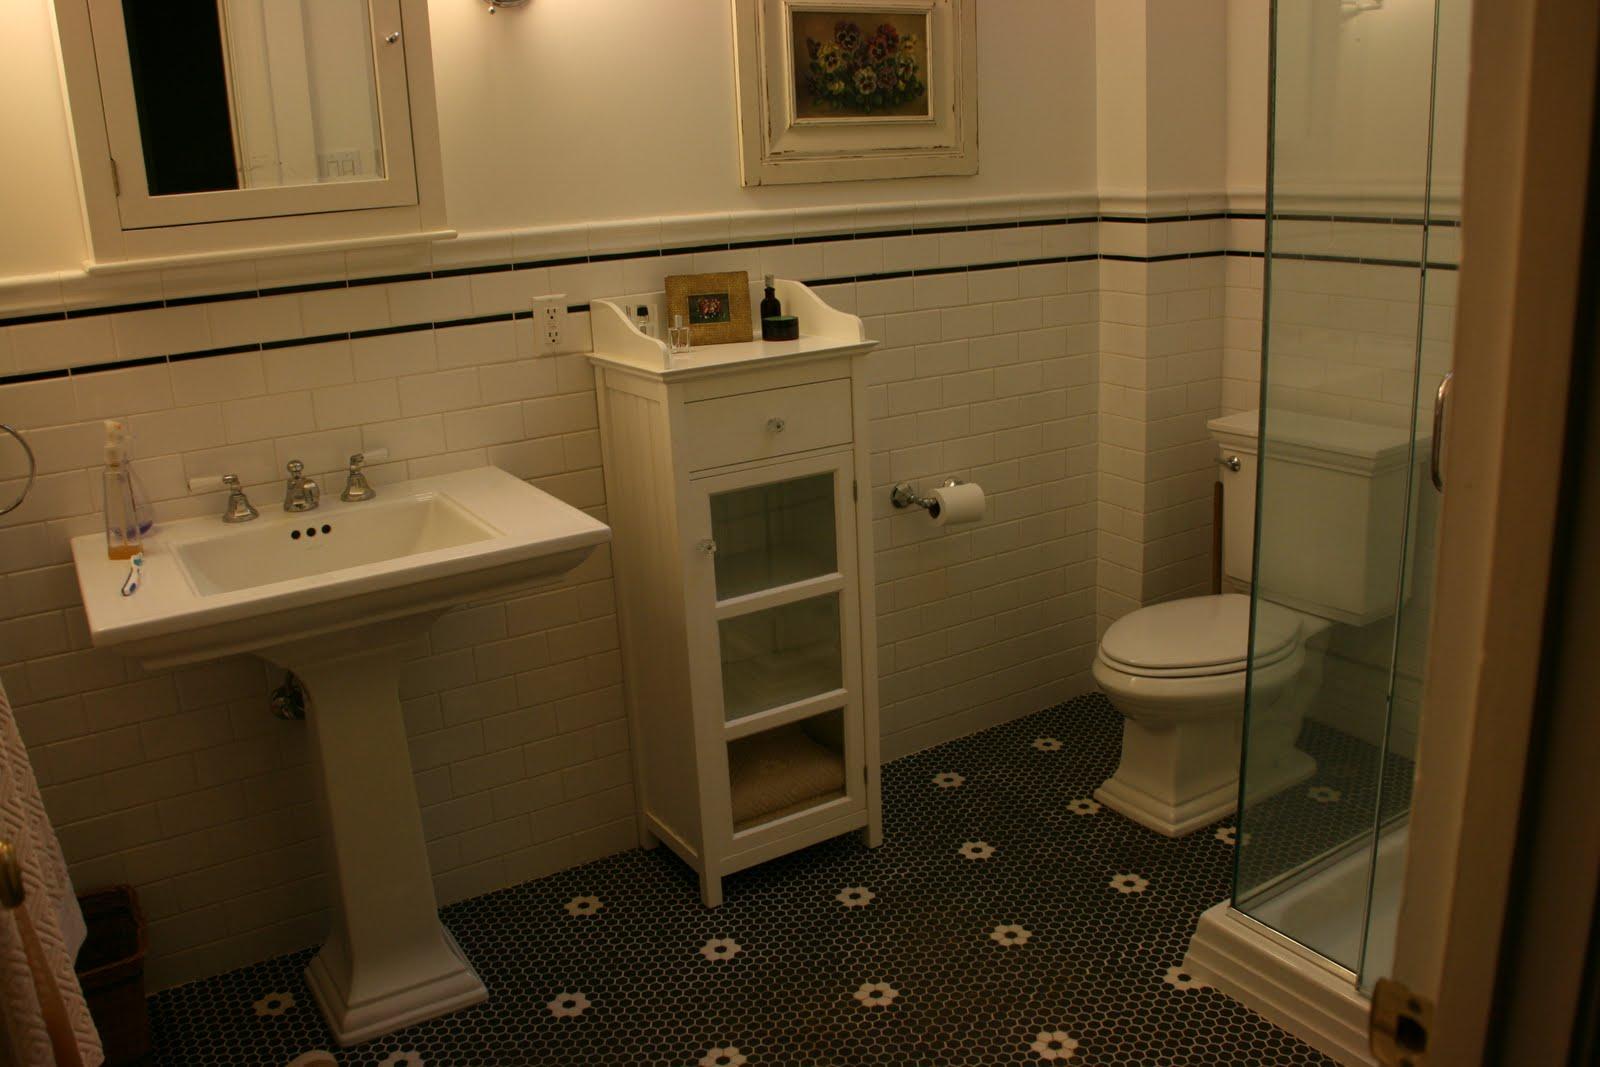 Vignette design tuesday inspiration chicken wire for Vintage bathroom ideas uk